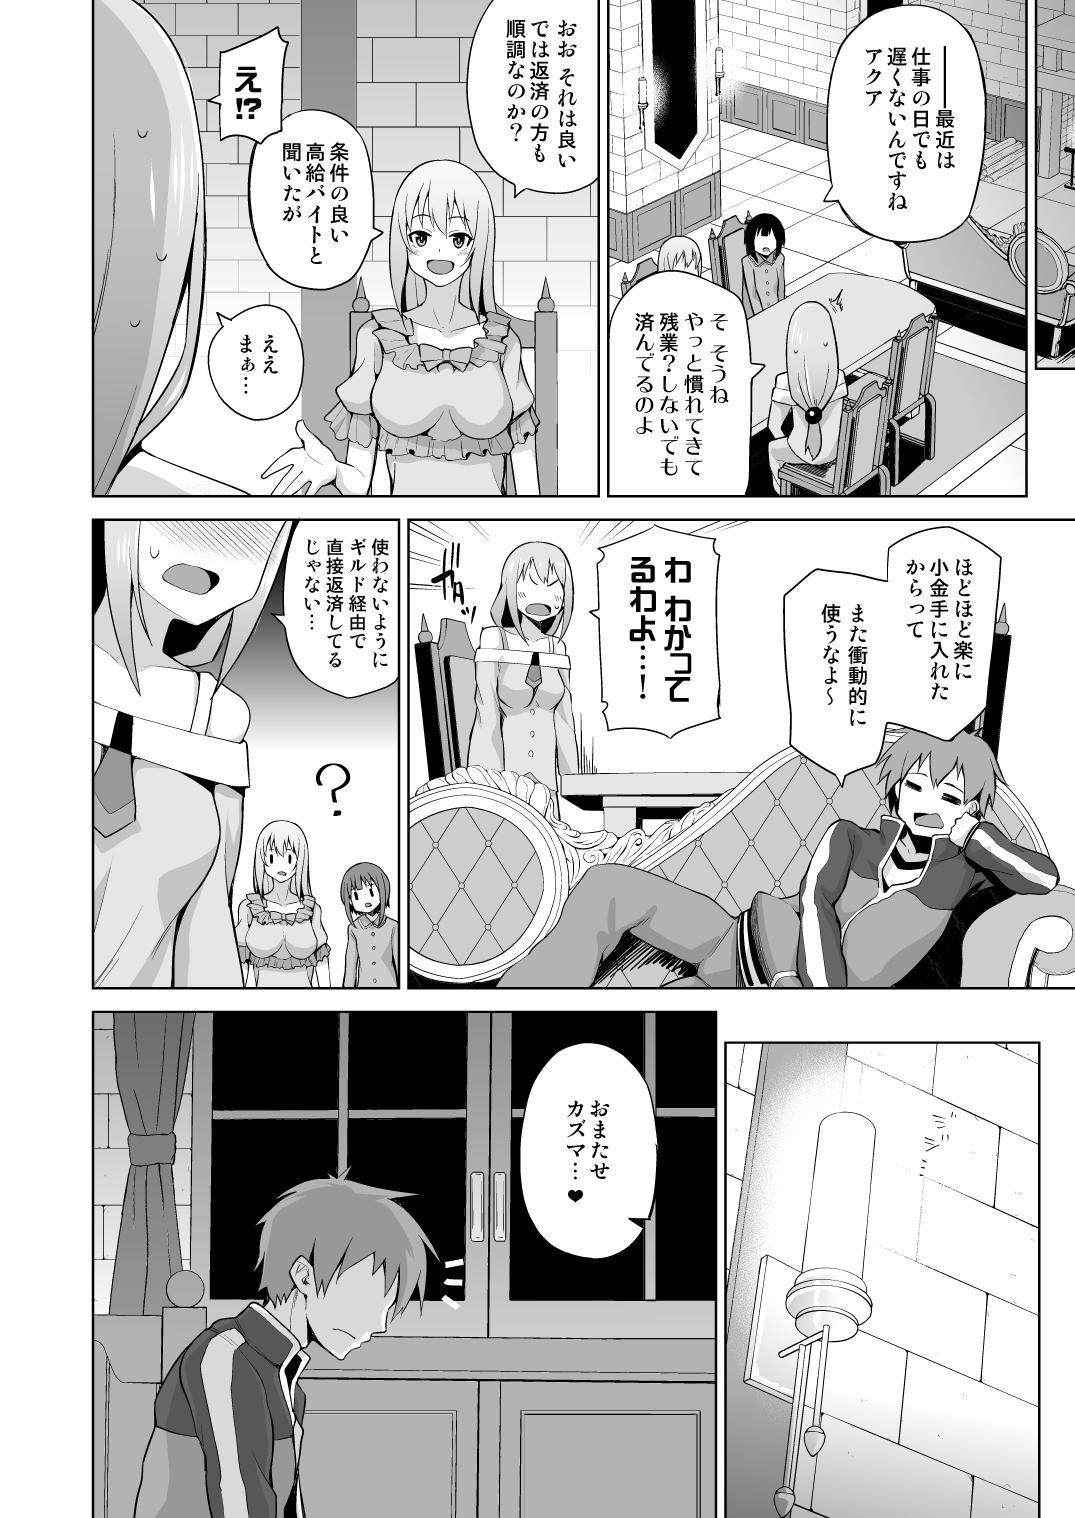 Damegami-sama no Succubus Beit! 41